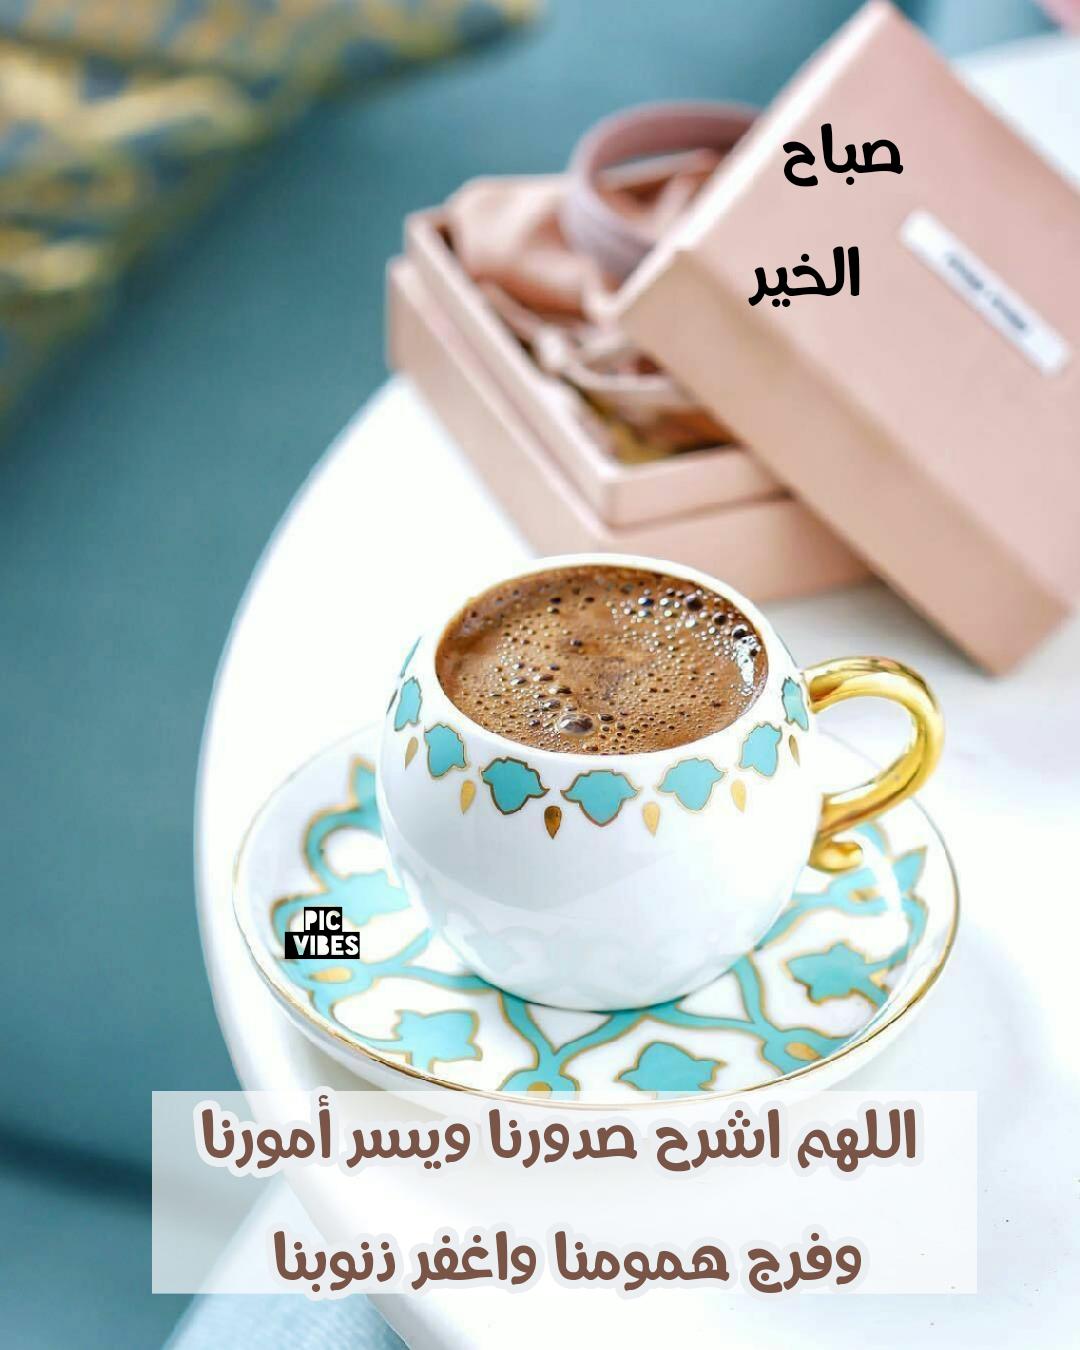 Pic Vibes دعاء اللهم أشرح صدورنا صباح الخير Good Morning Wishes Good Morning Greetings Morning Texts